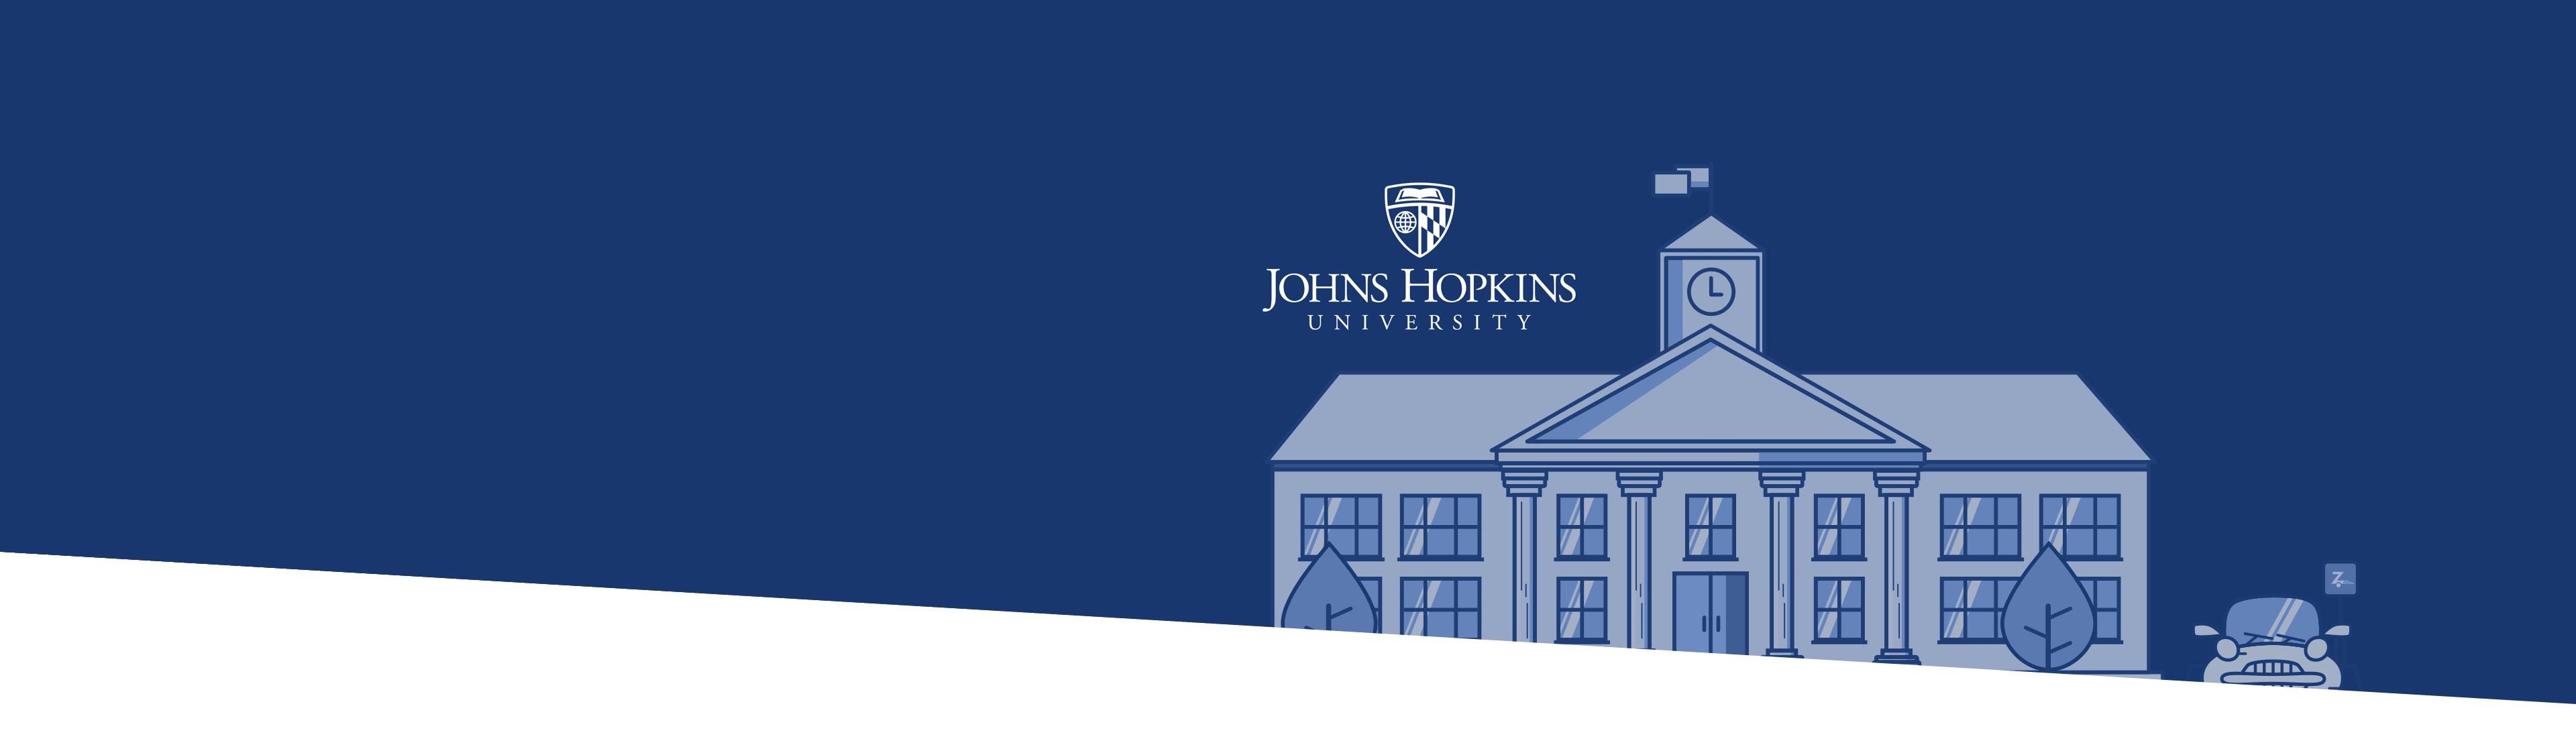 John Hopkins University campus buildings and logo